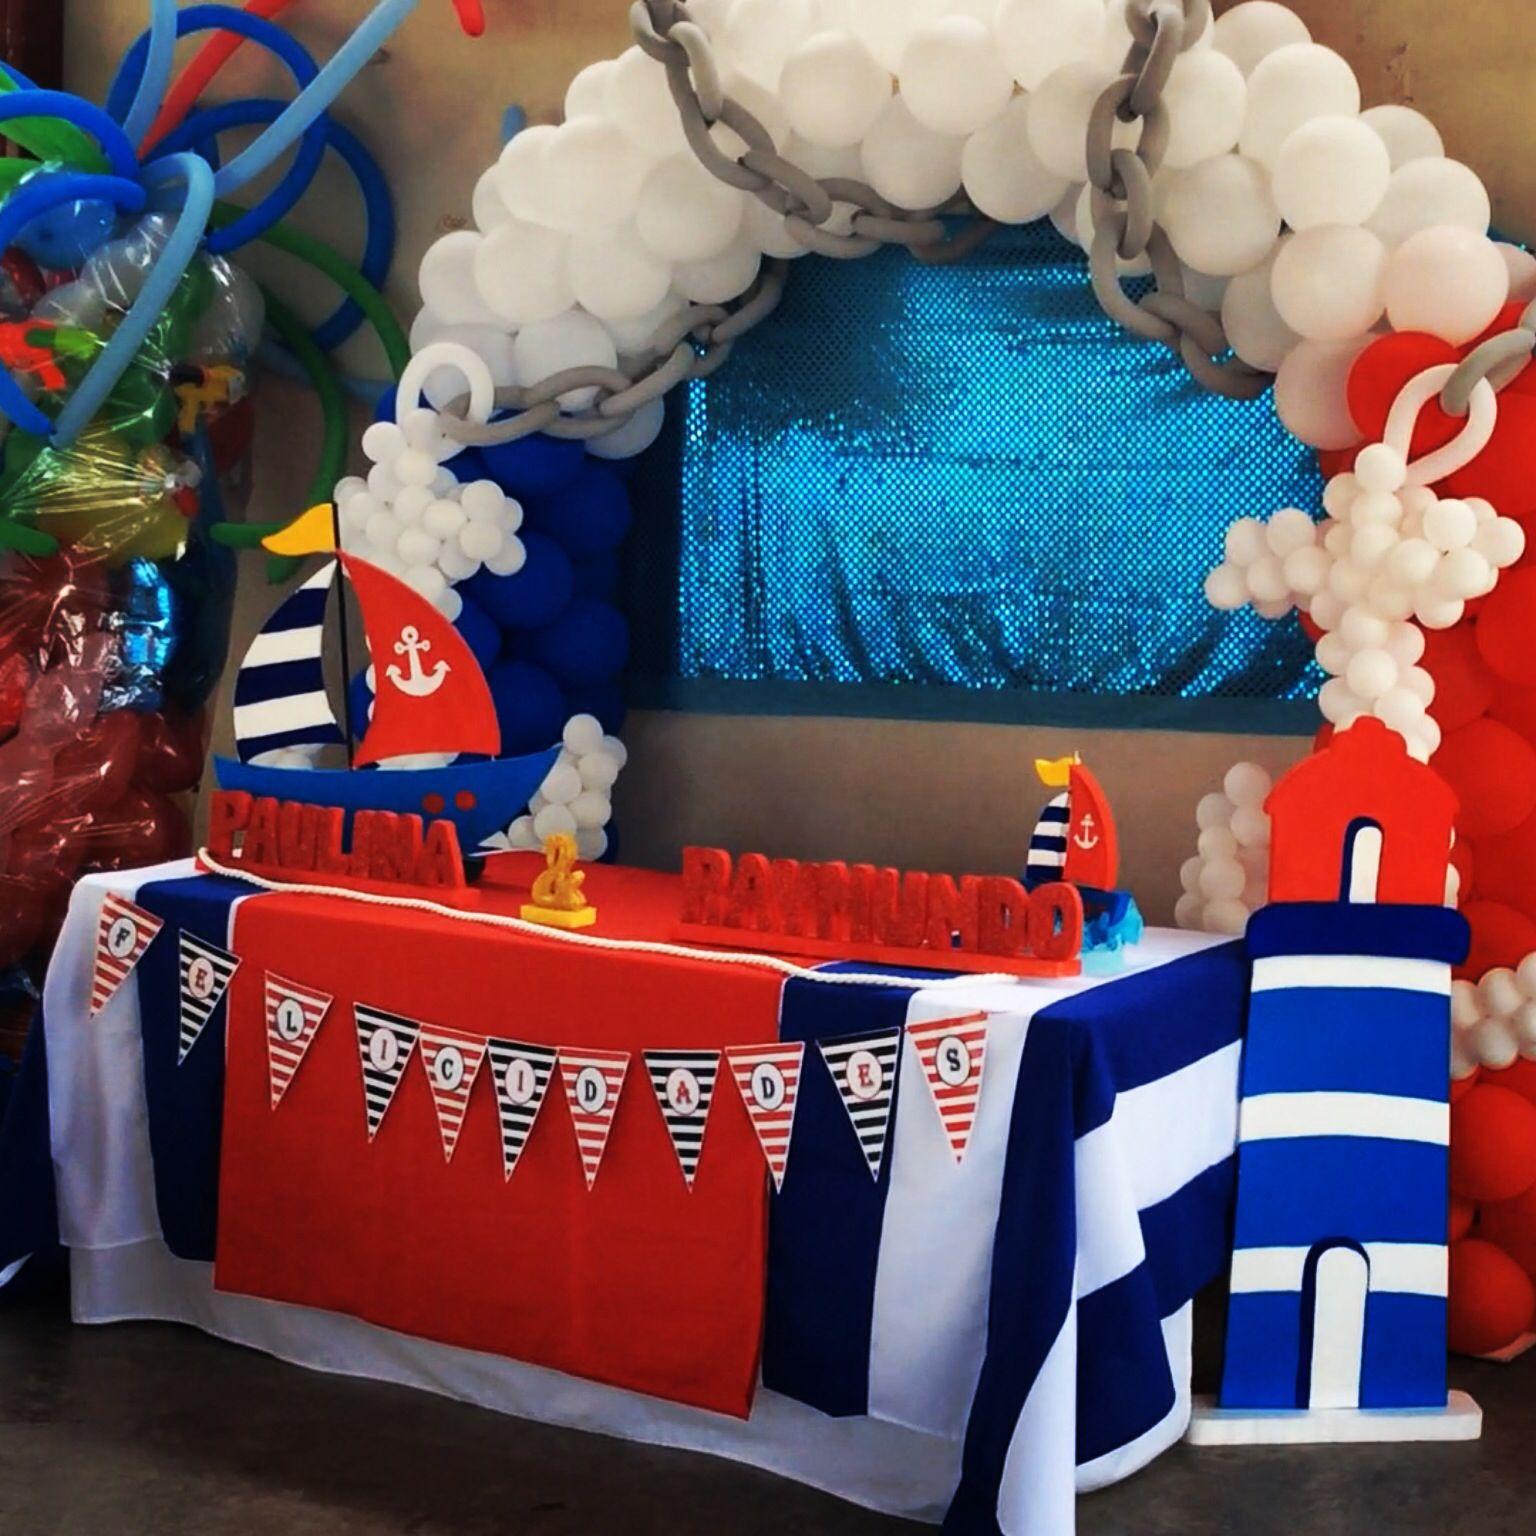 Fiesta n utica por balloon decoraci n decoracion eventos for Decoracion nautica infantil